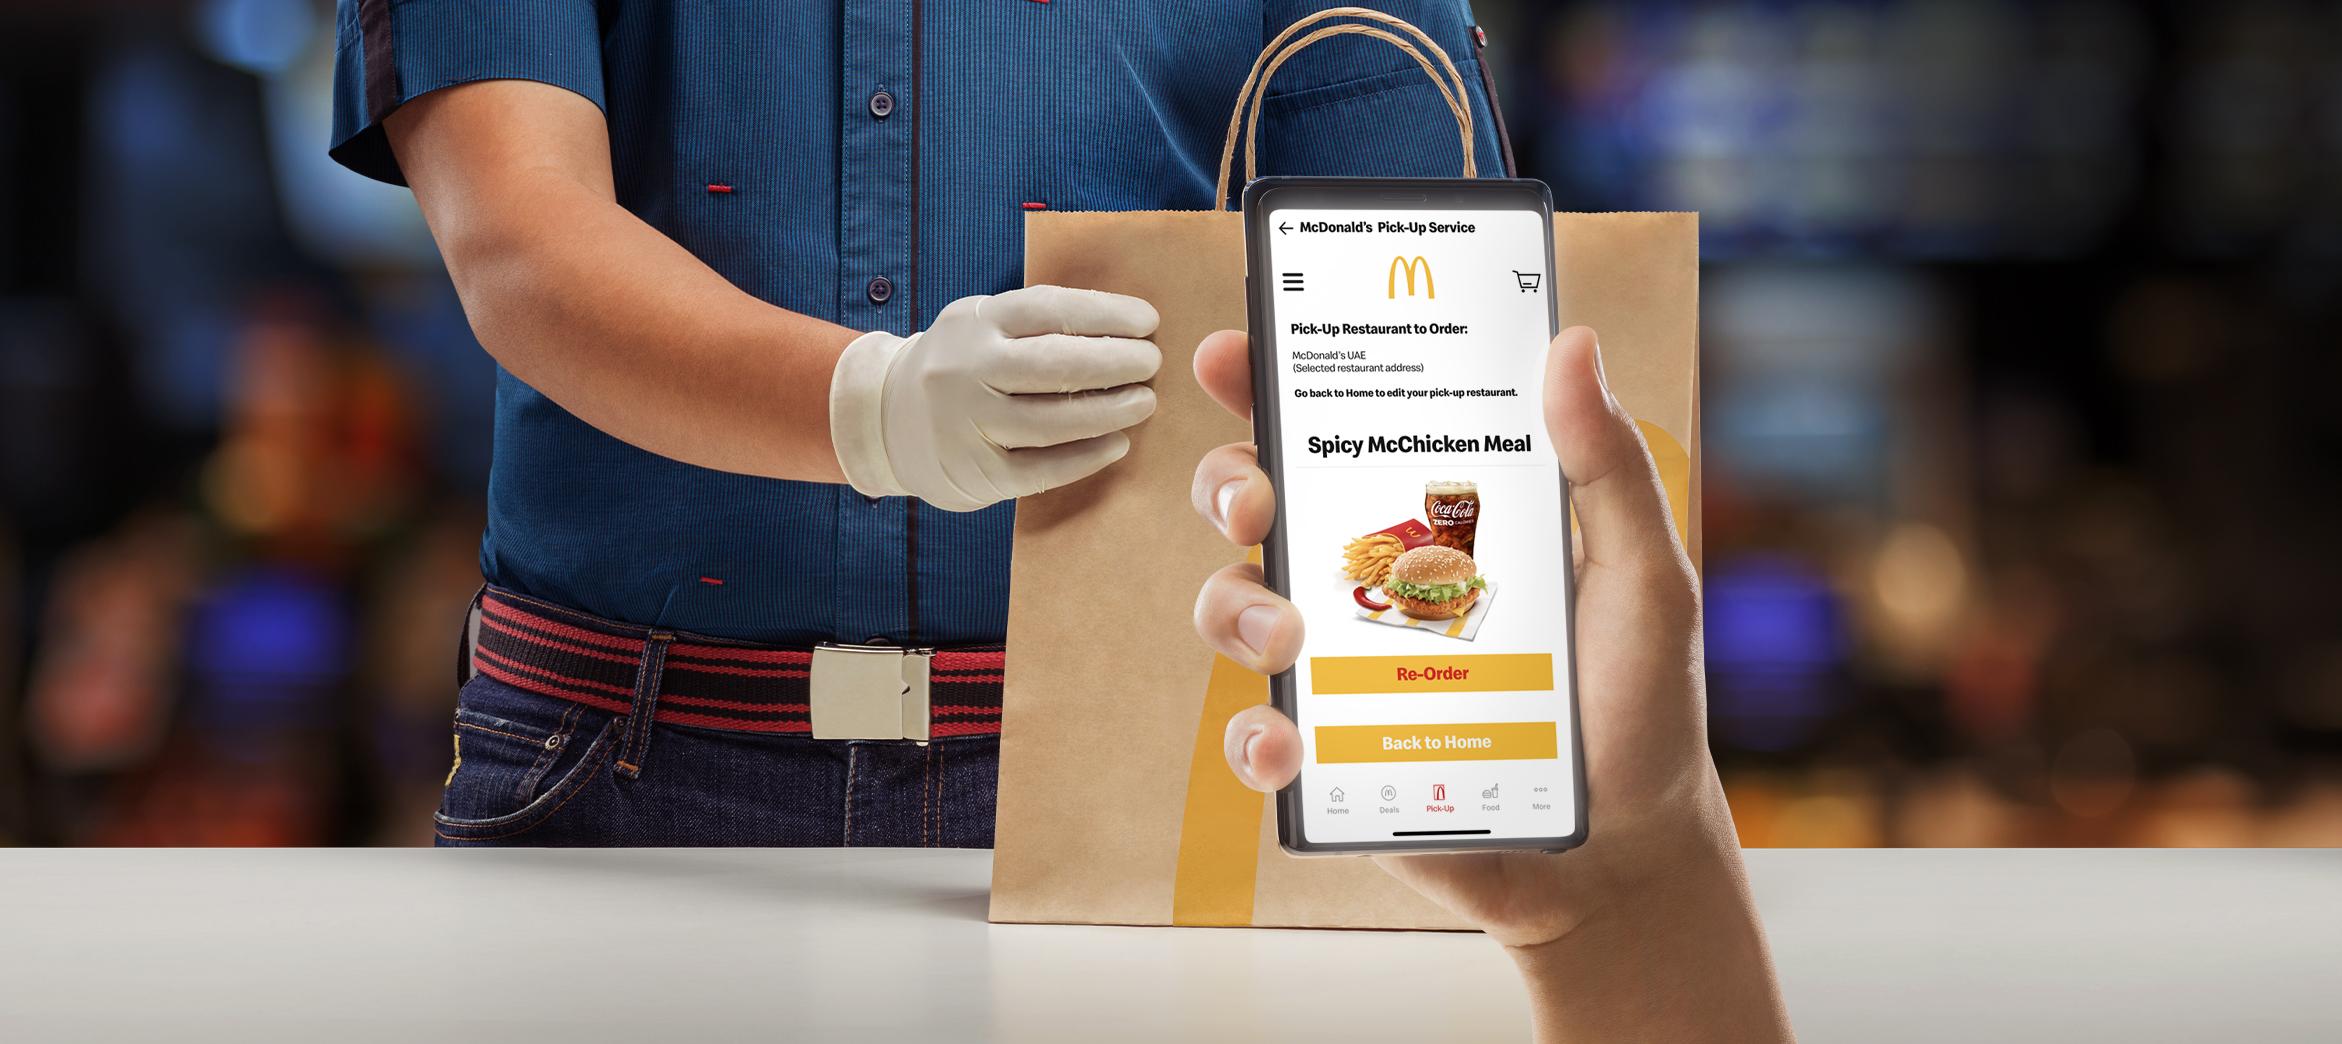 McDonald's UAE launches pick-up service